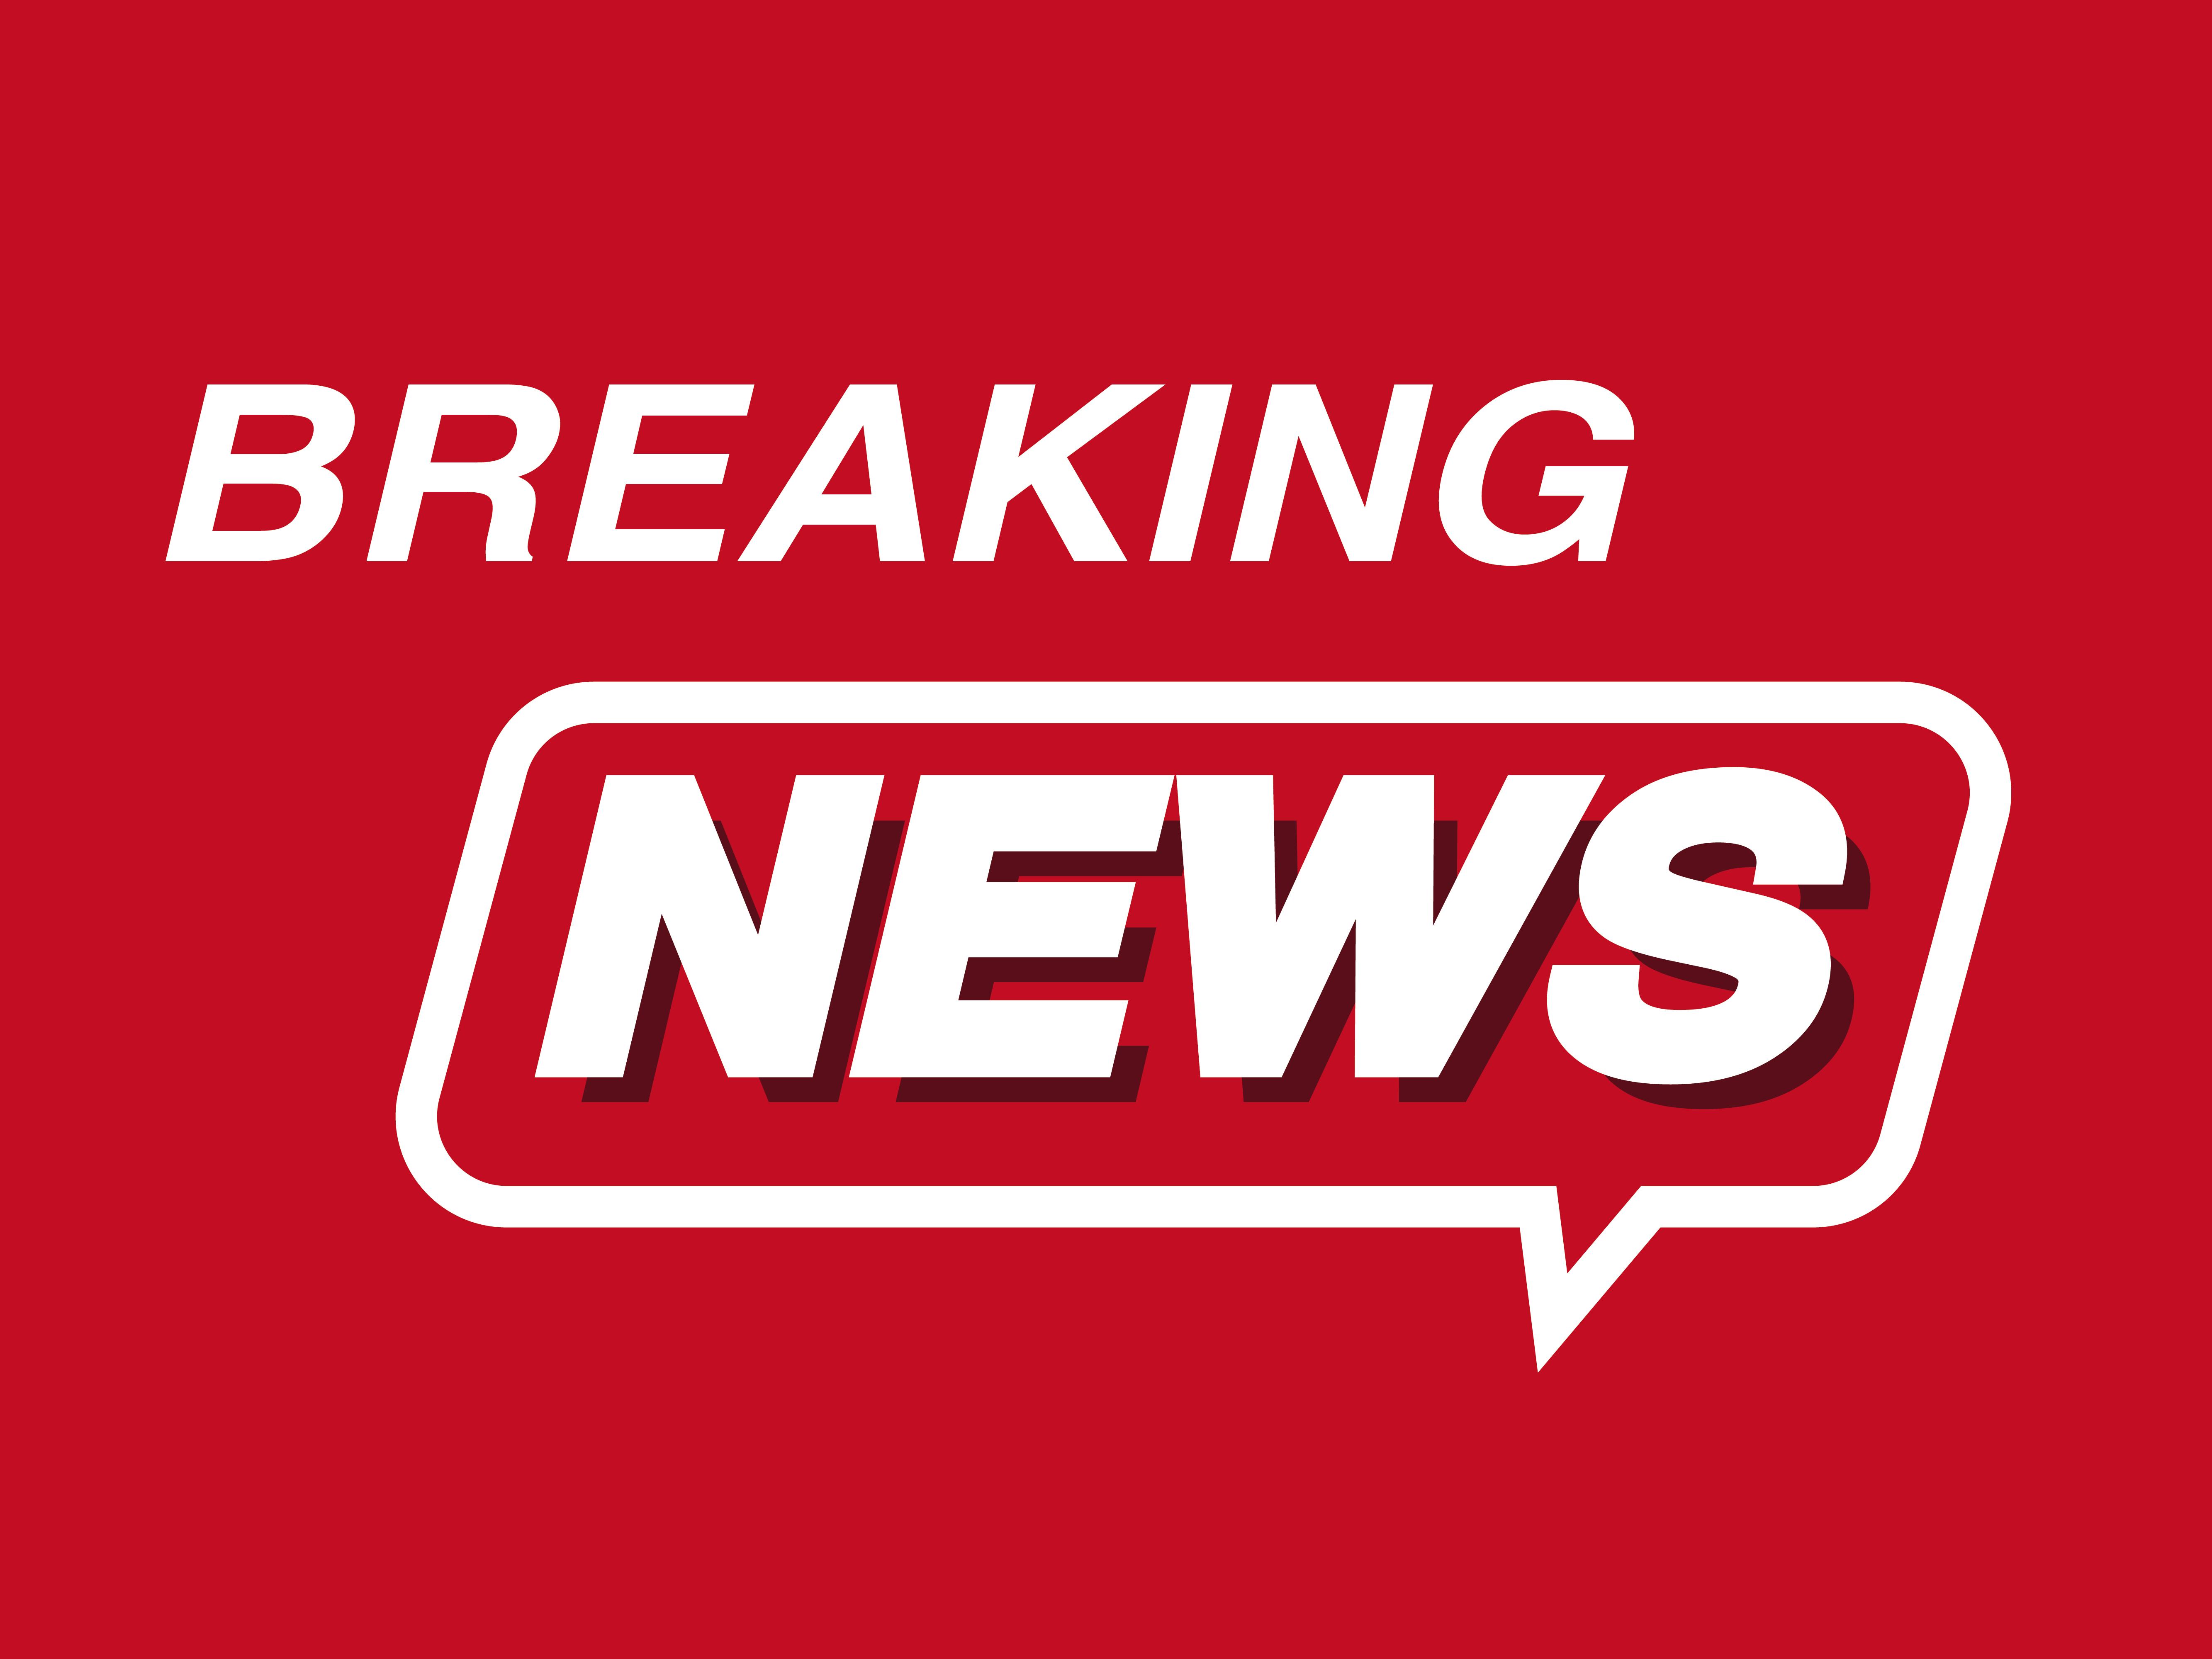 3 gunmen break into gov't building in Iraq's Erbil, all killed